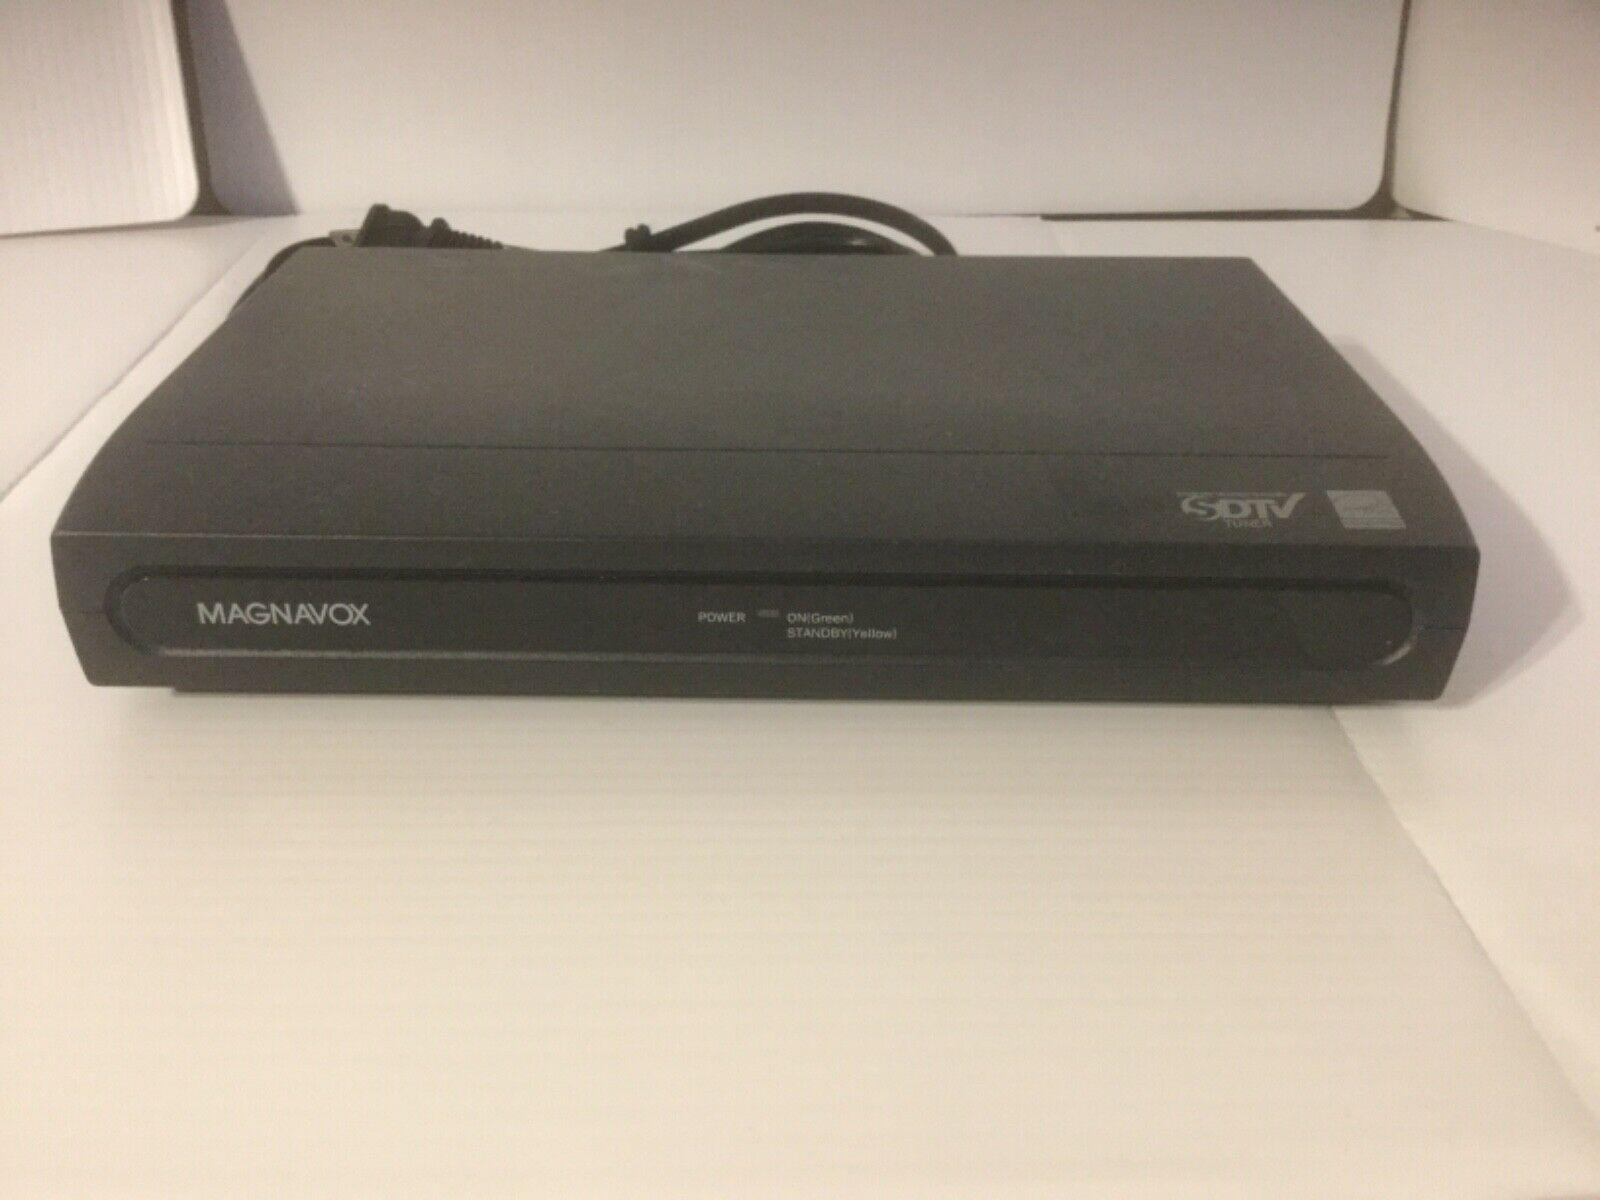 New MAGNAVOX DTV Digital to Analog Converter Model TB110MW9A